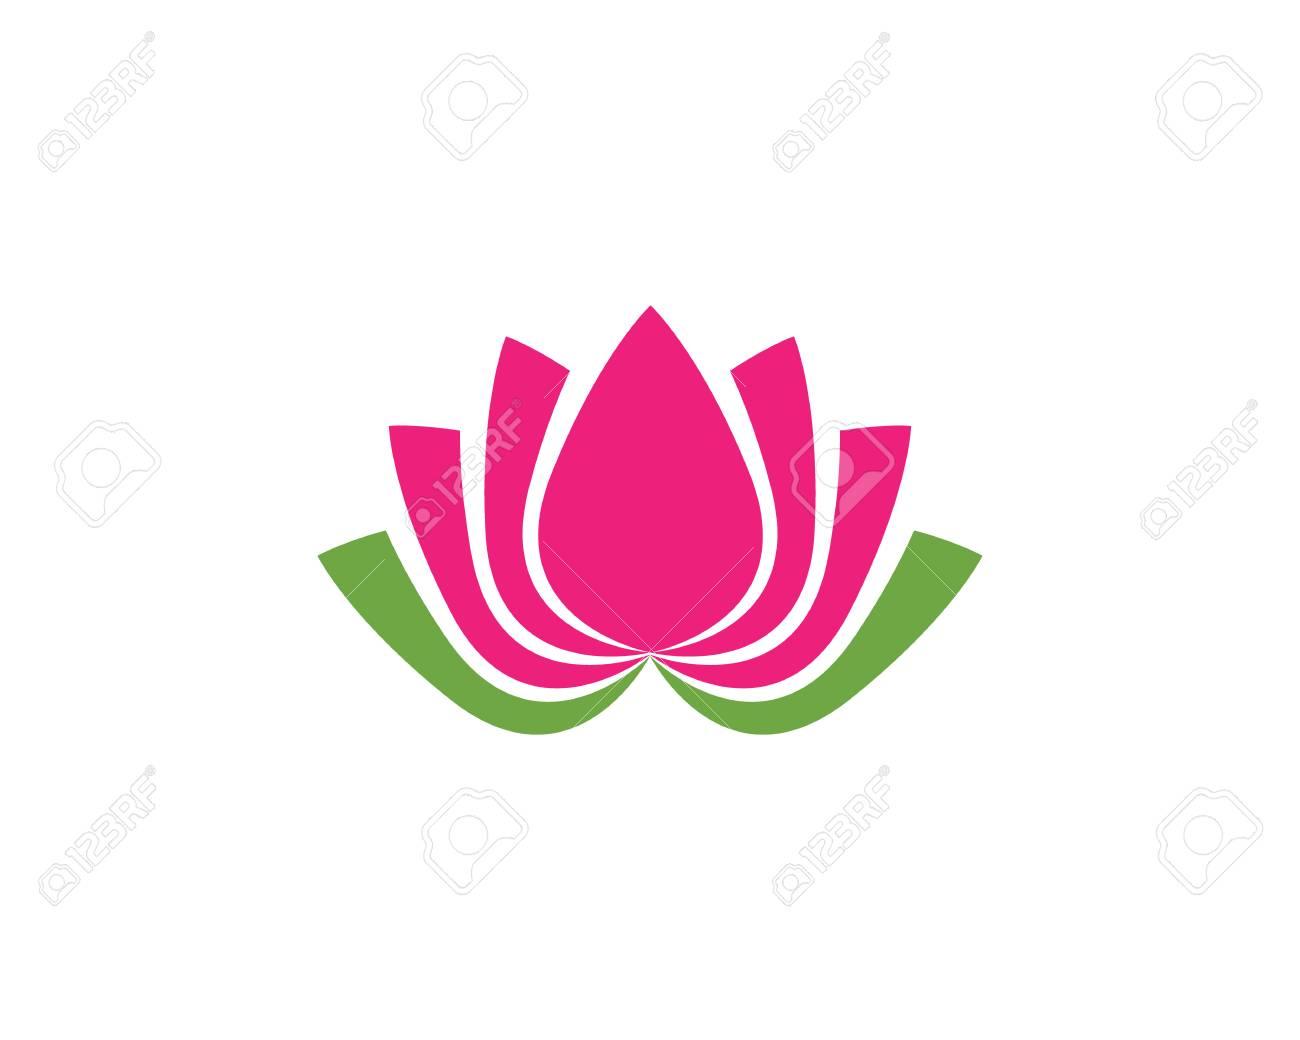 lotus flowers logo royalty free cliparts vectors and stock rh 123rf com  lotus flower logo design